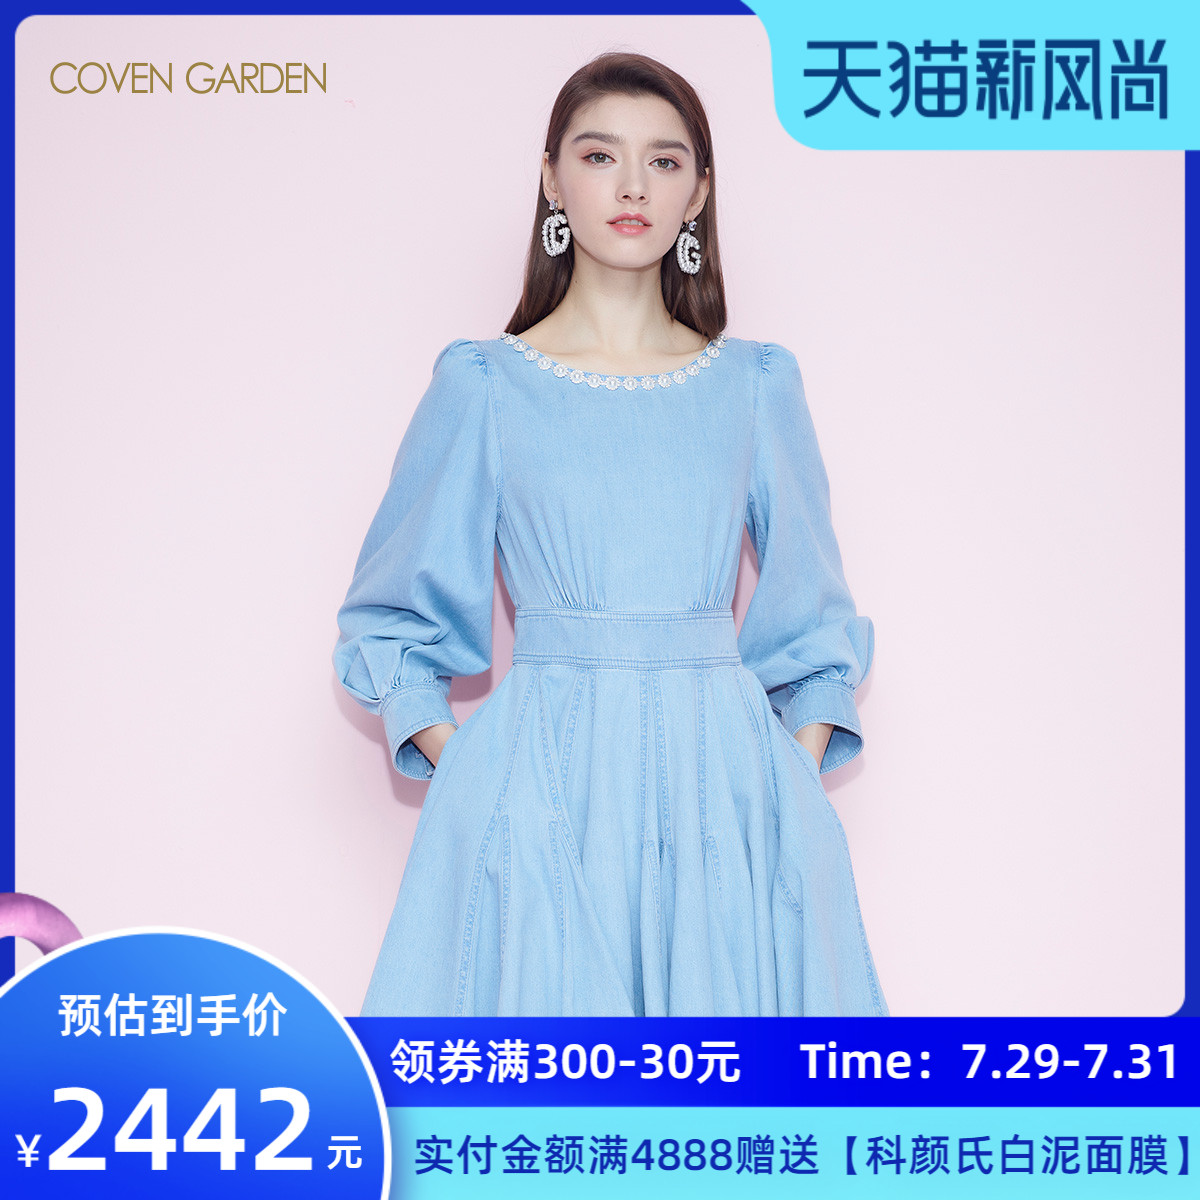 COVEN GARDEN/哥文花园21年新款夏季纯棉牛仔泡泡袖a字连衣裙